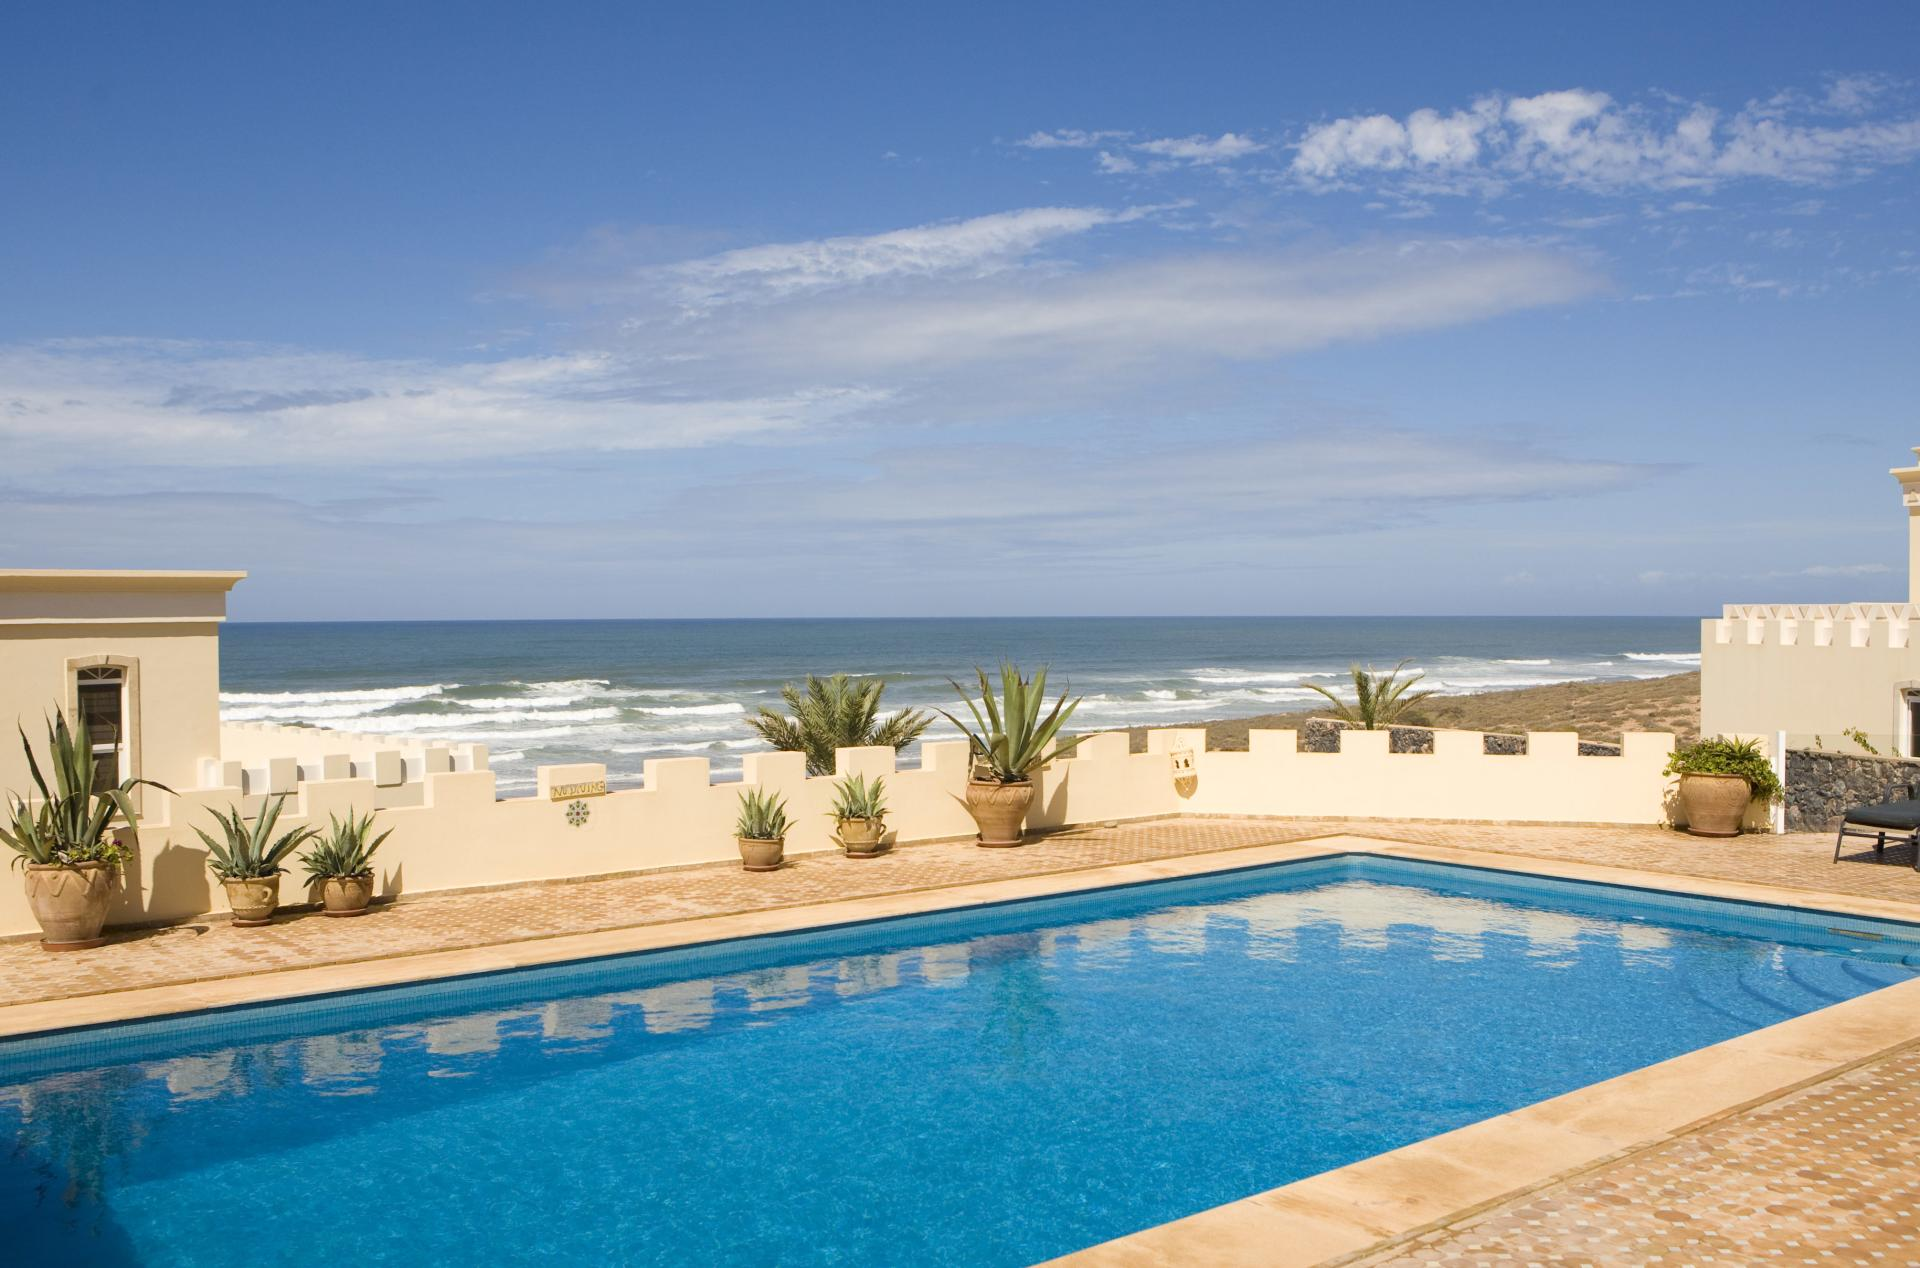 Outdoor Pool 1, Dar l'Oussia, Agadir, Aglou Plage.